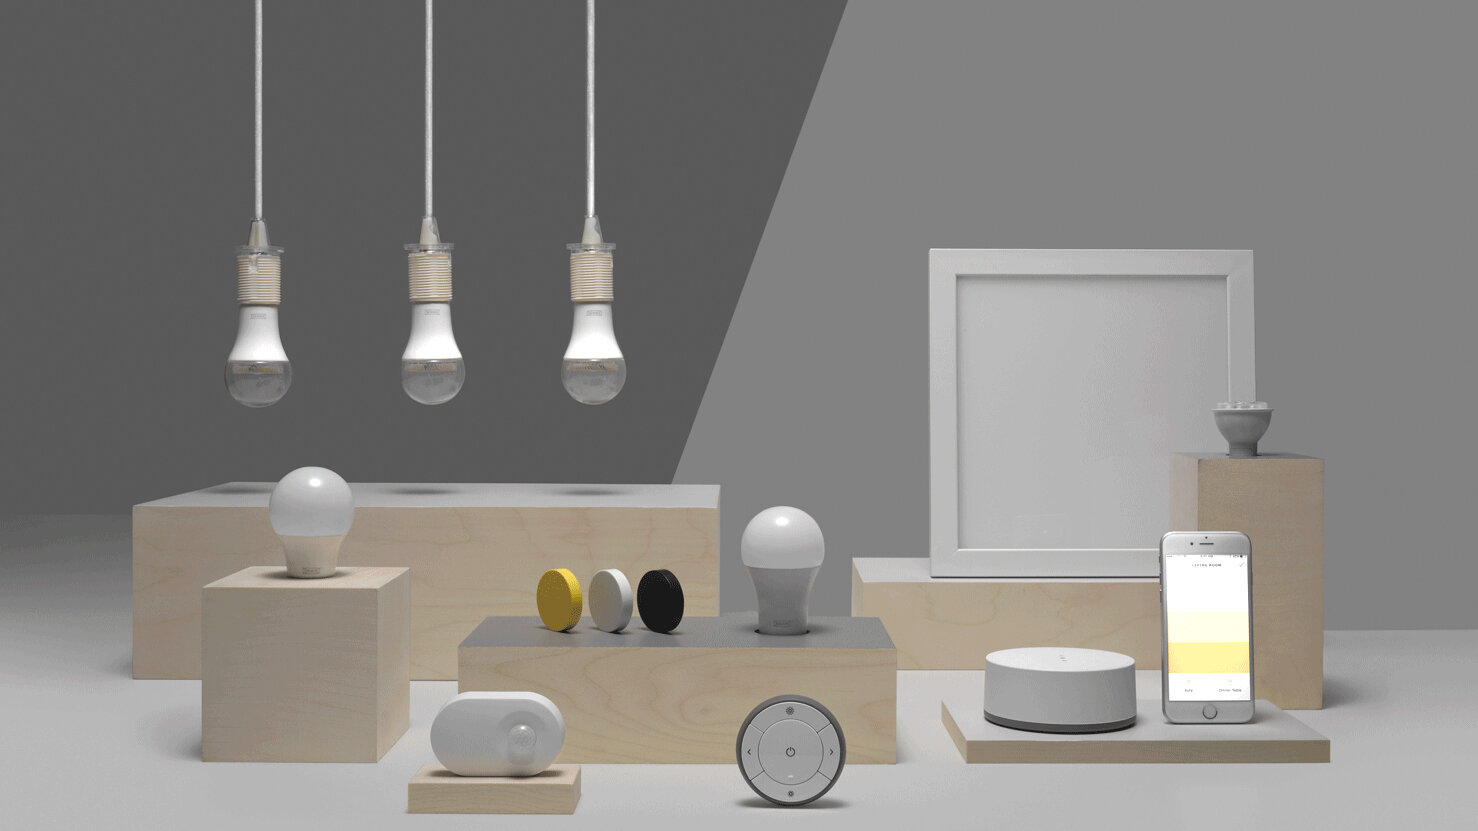 Ikea Smart Home Steckdose